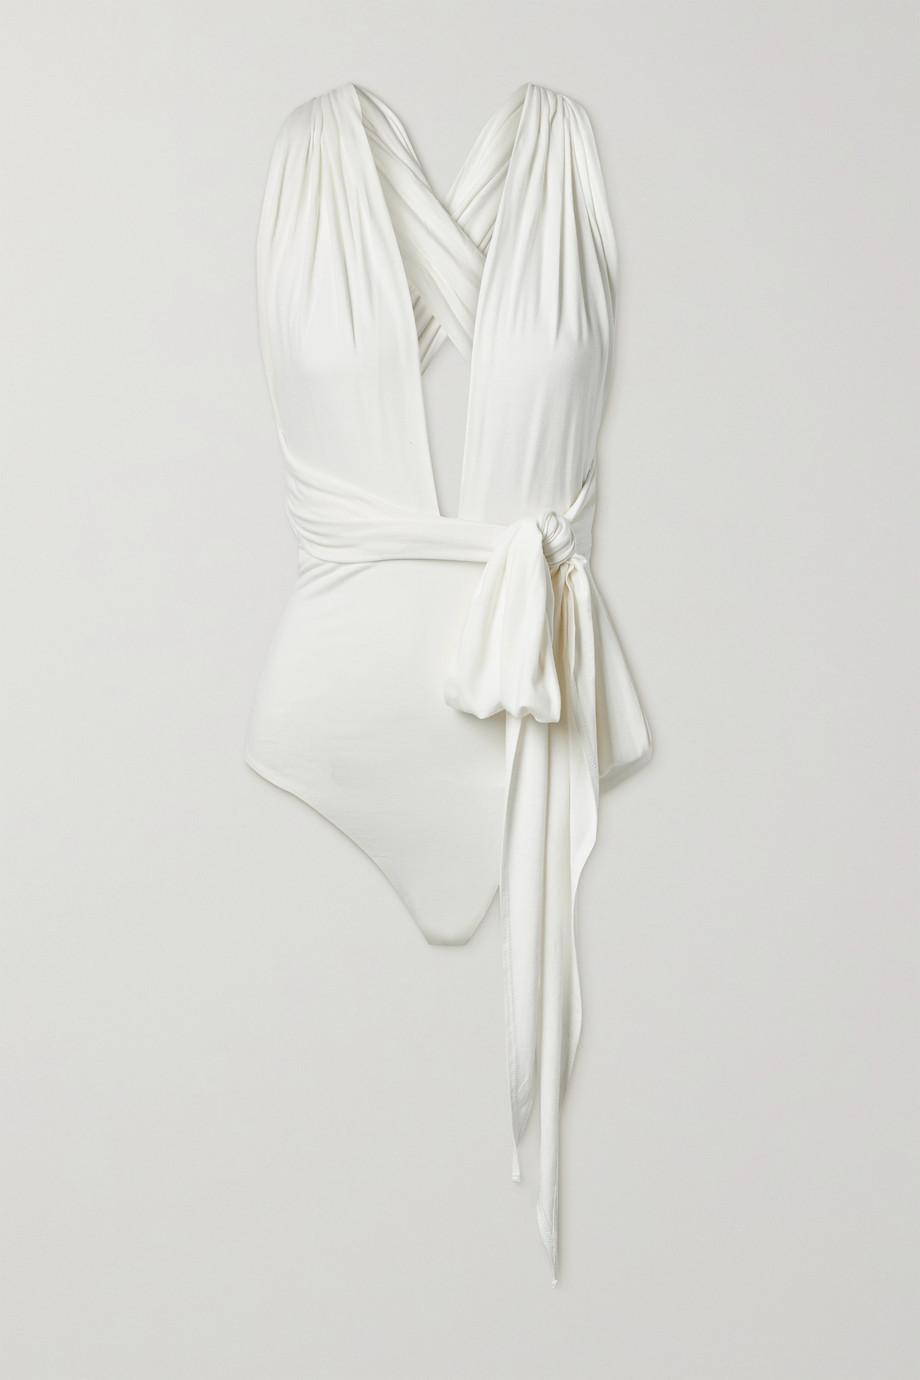 Marika Vera Alice wandelbarer String-Body aus Stretch-Jersey